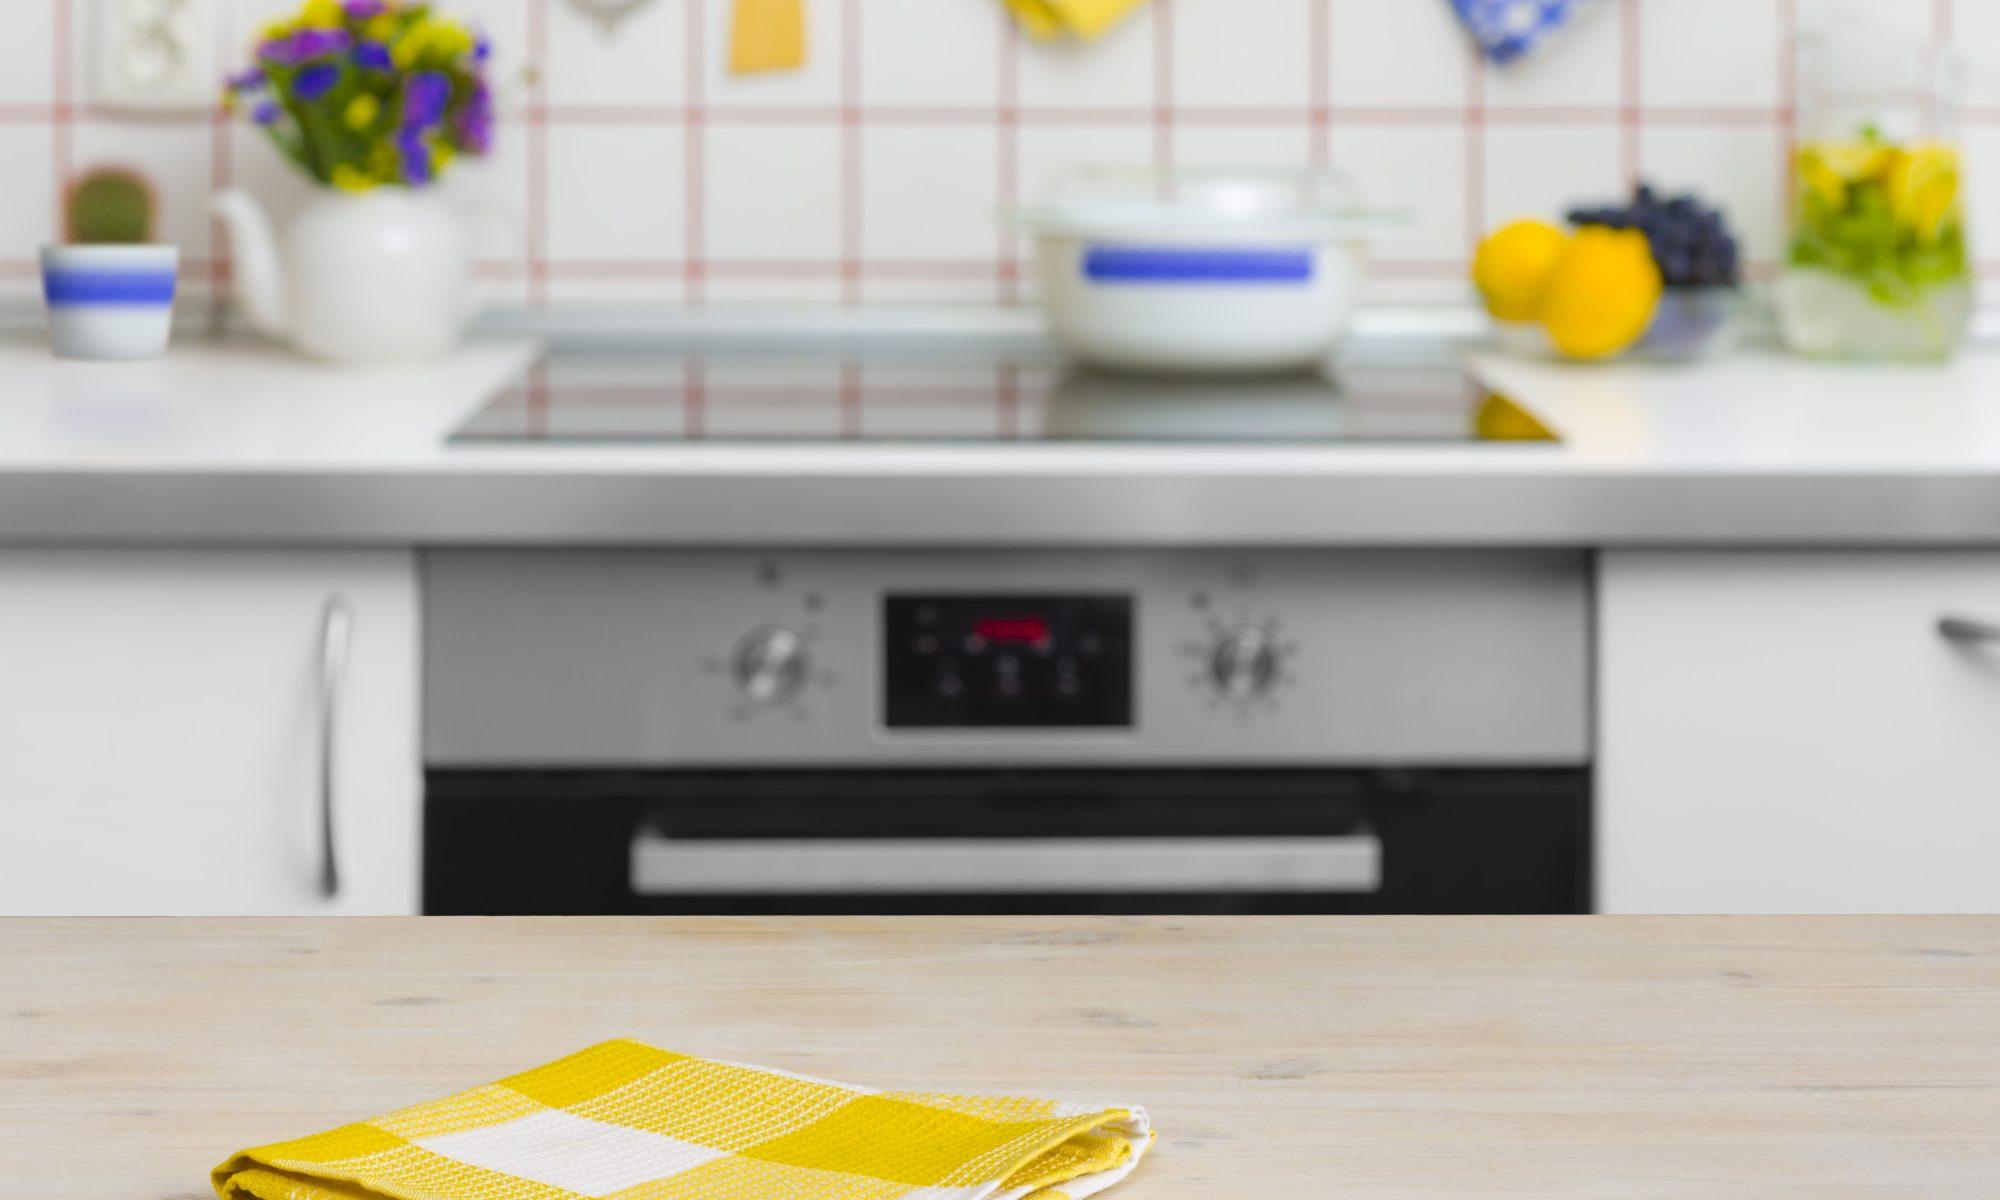 Cucina: i prodotti top per prendertene cura!